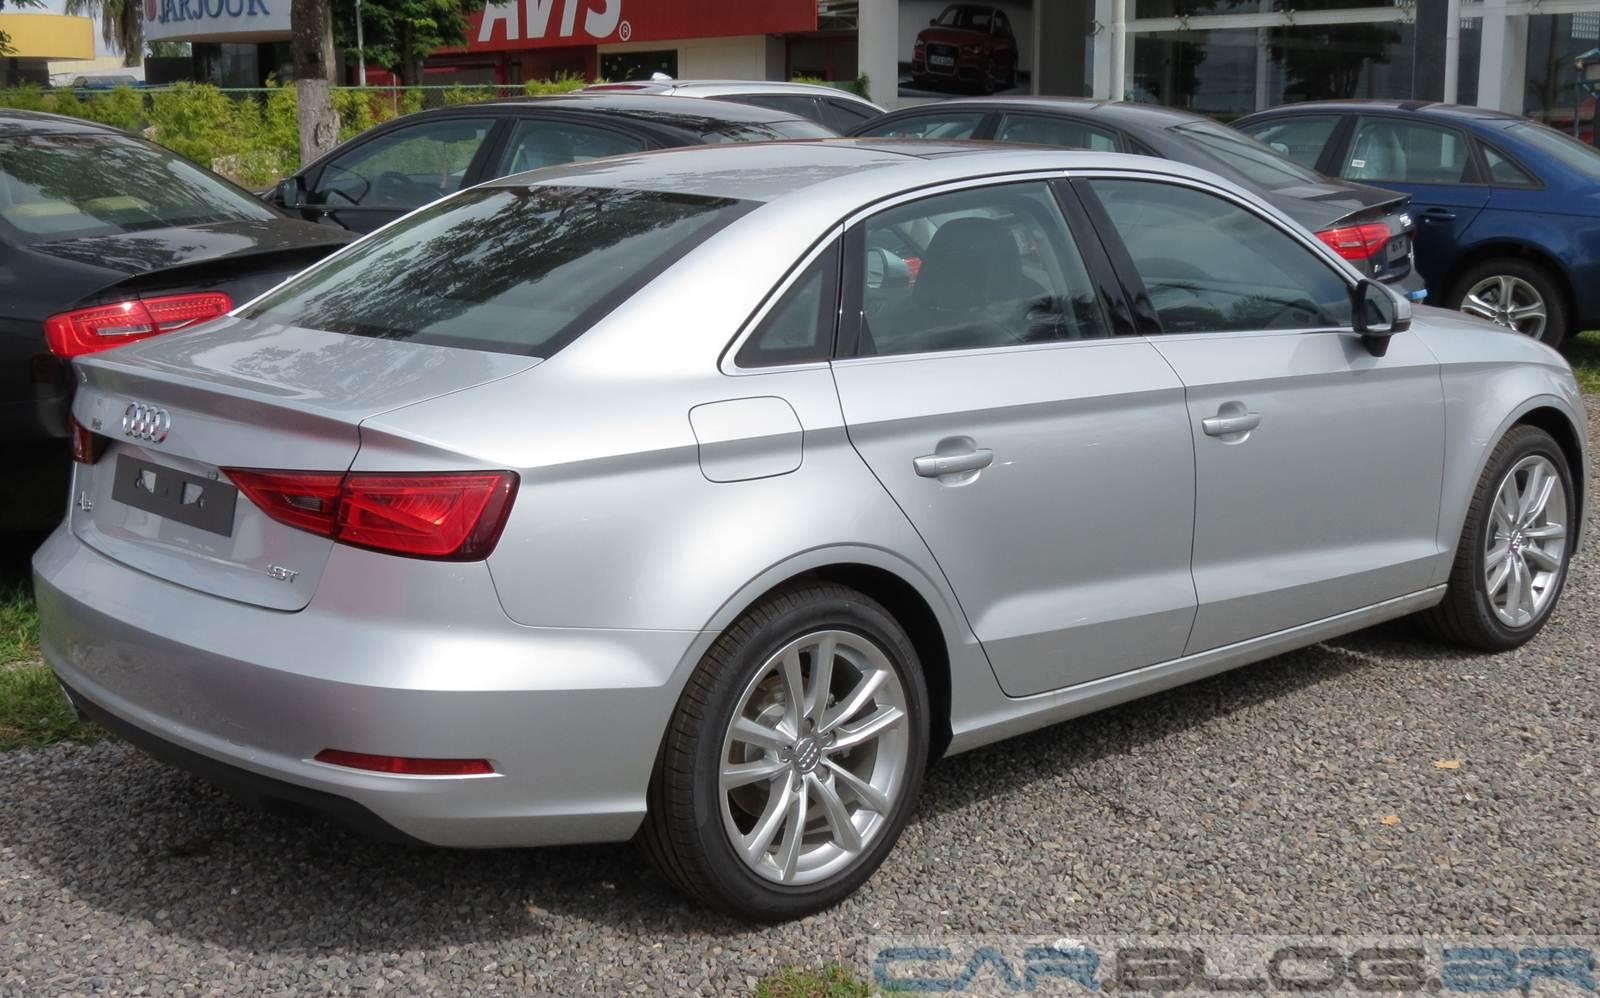 Novo Audi A3 Sedan 2014 - Prata